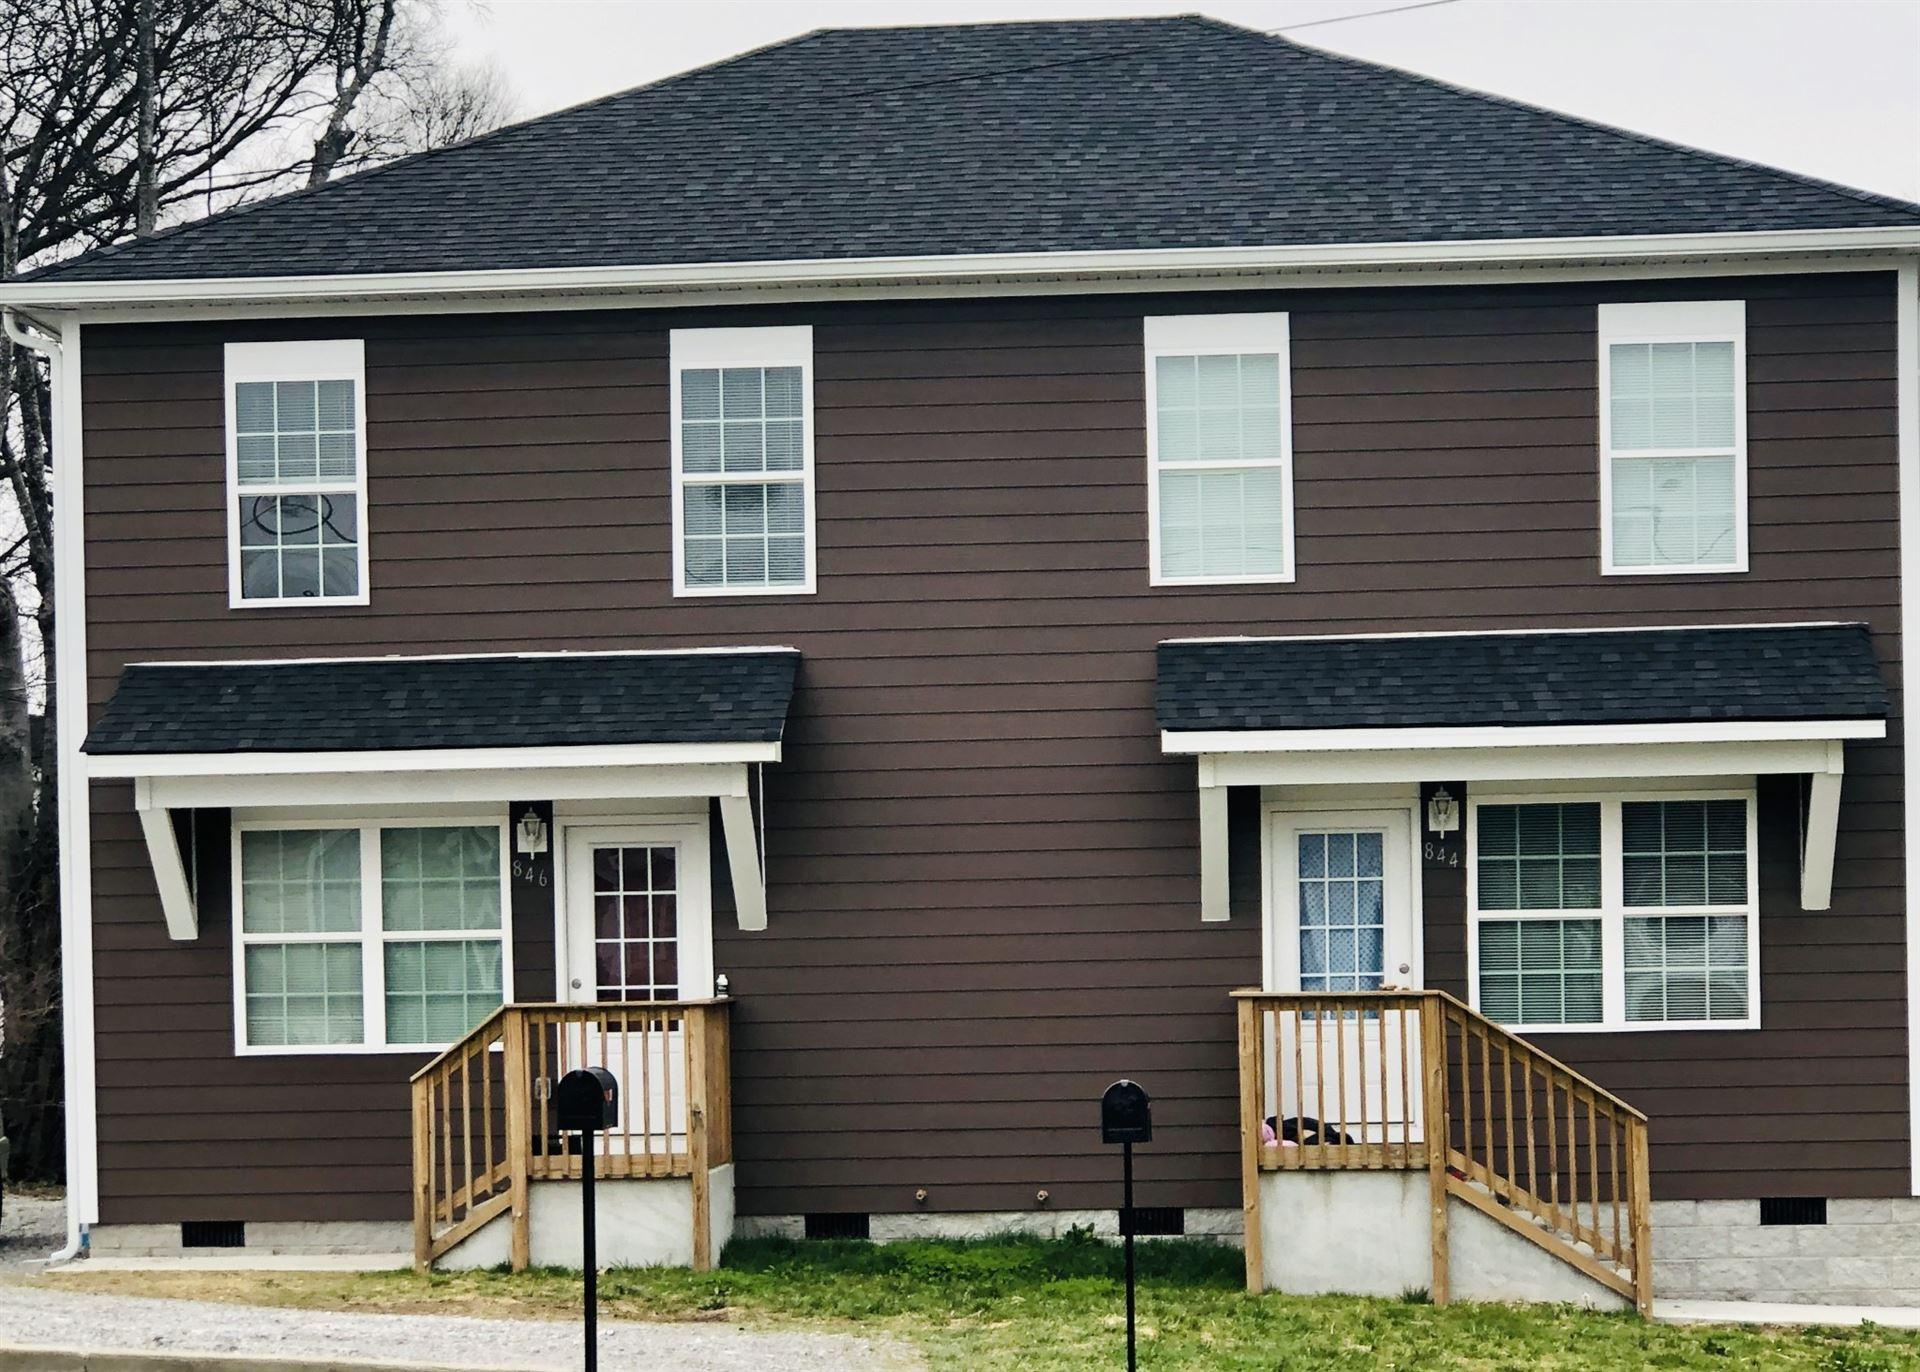 844 W Commerce St, Lewisburg, TN 37091 - MLS#: 2189112